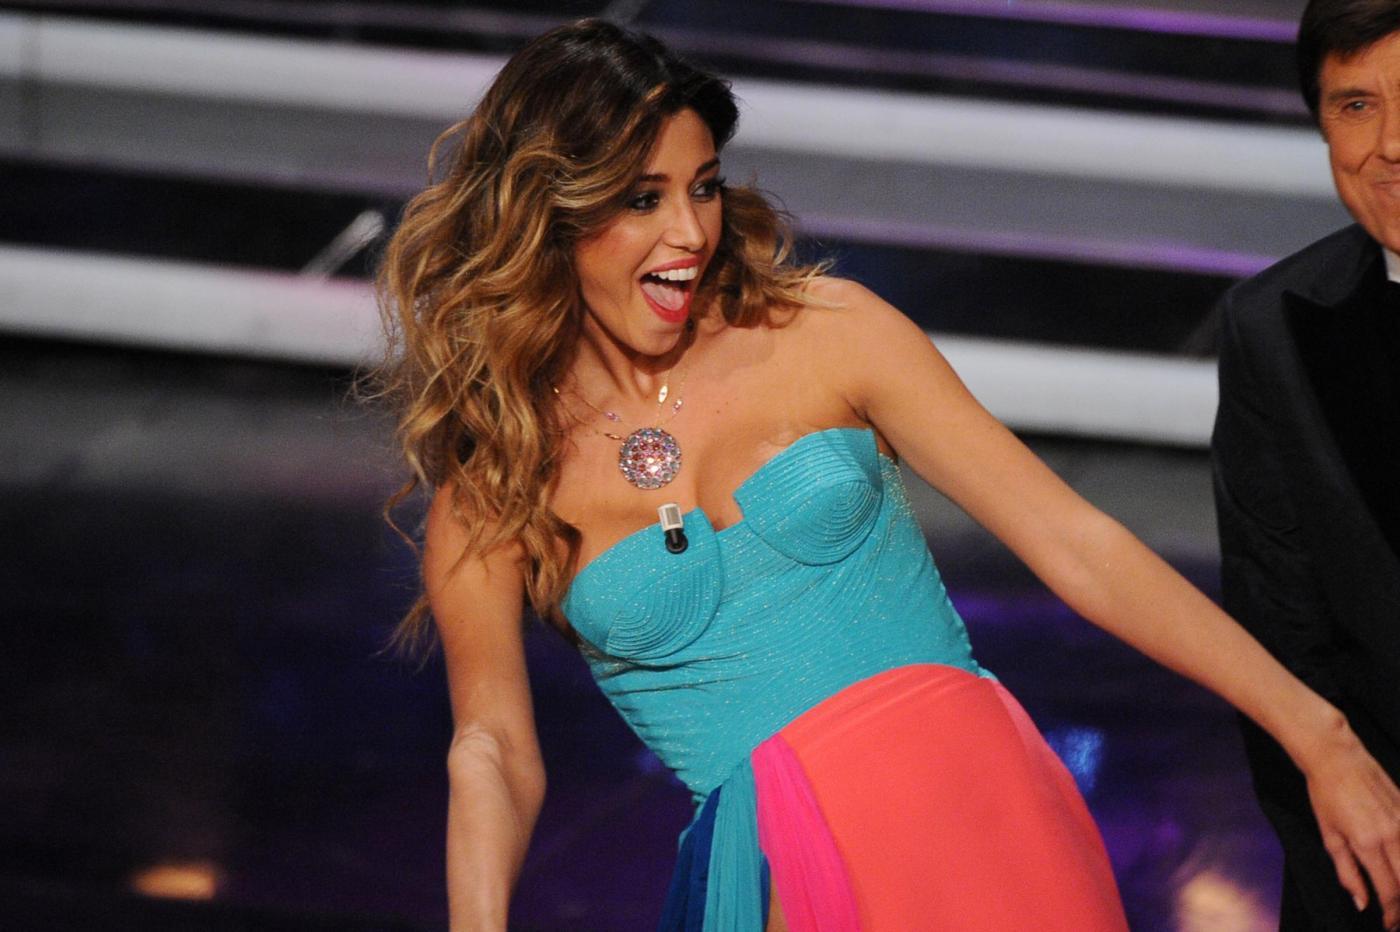 Le Iene, Belen Rodriguez prossima conduttrice? Ilary Blasi vicina al GF13